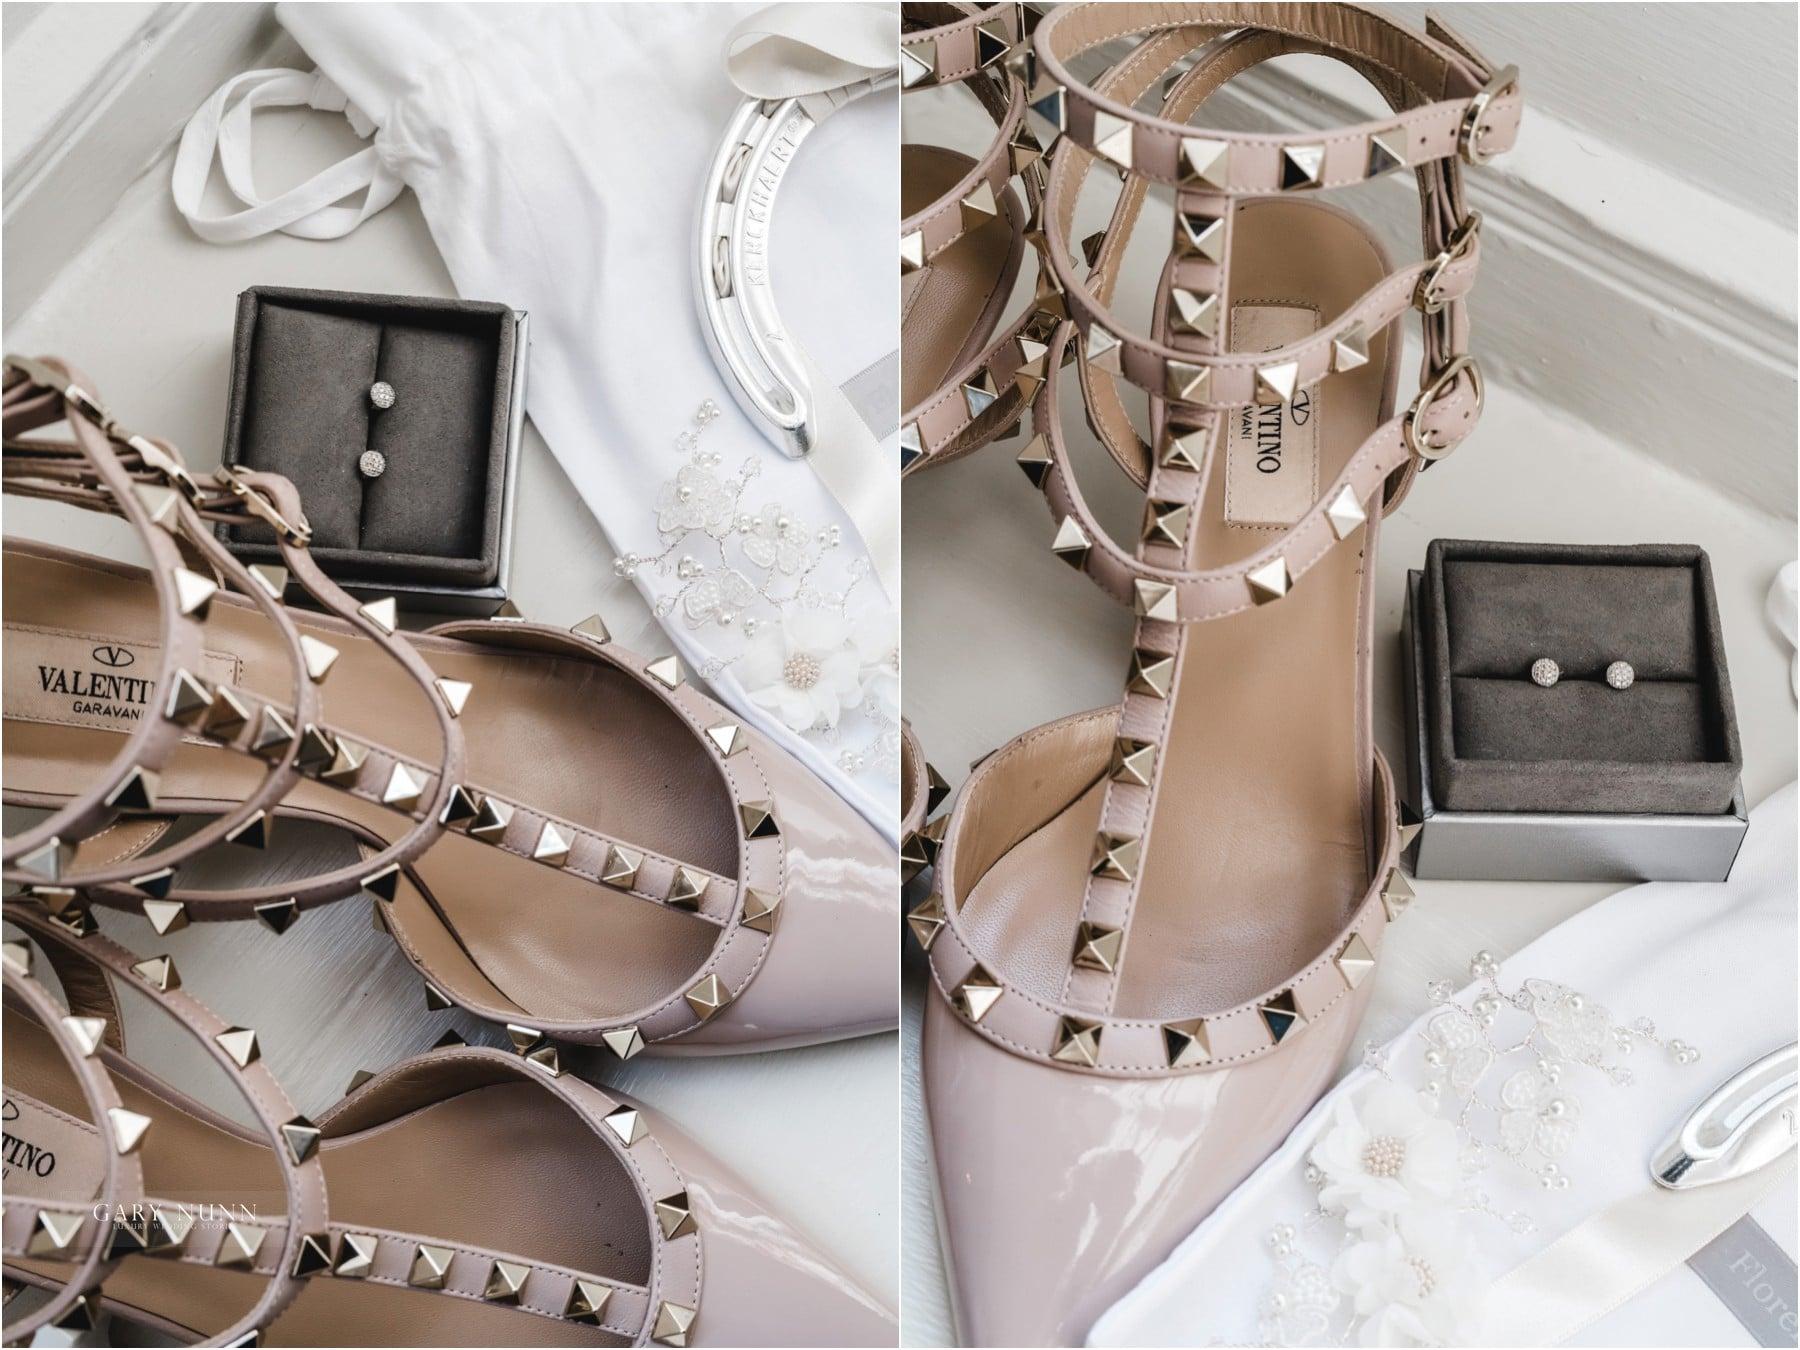 Elmore Court, wedding accessories, wedding photographer Aylesbury